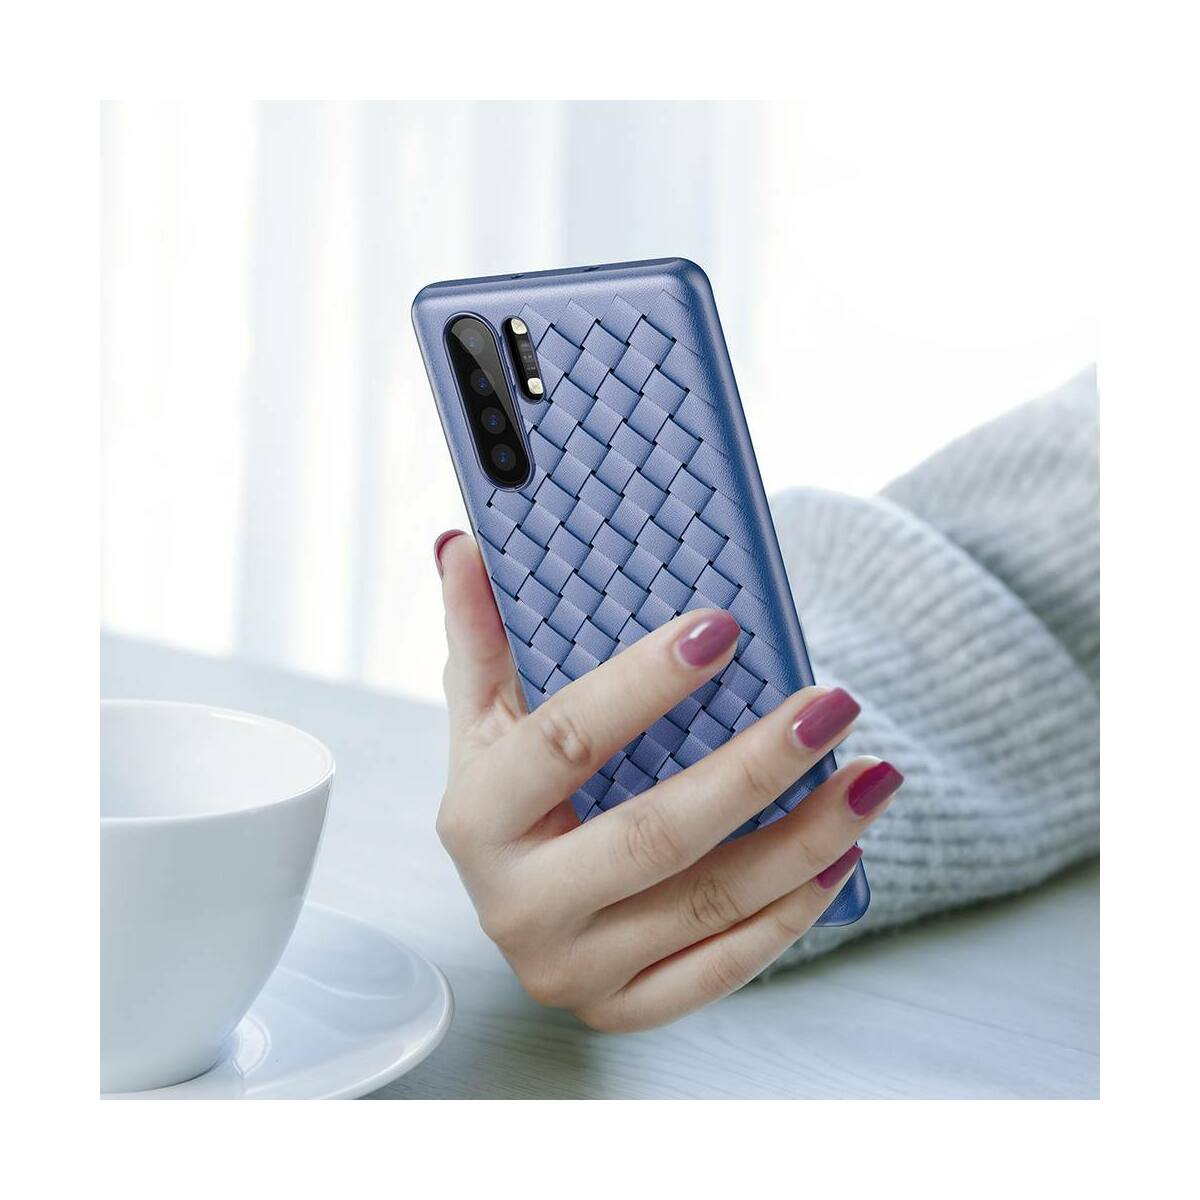 Baseus Huawei P30 Pro tok, Weaving, kék (WIHWP30P-BV03)